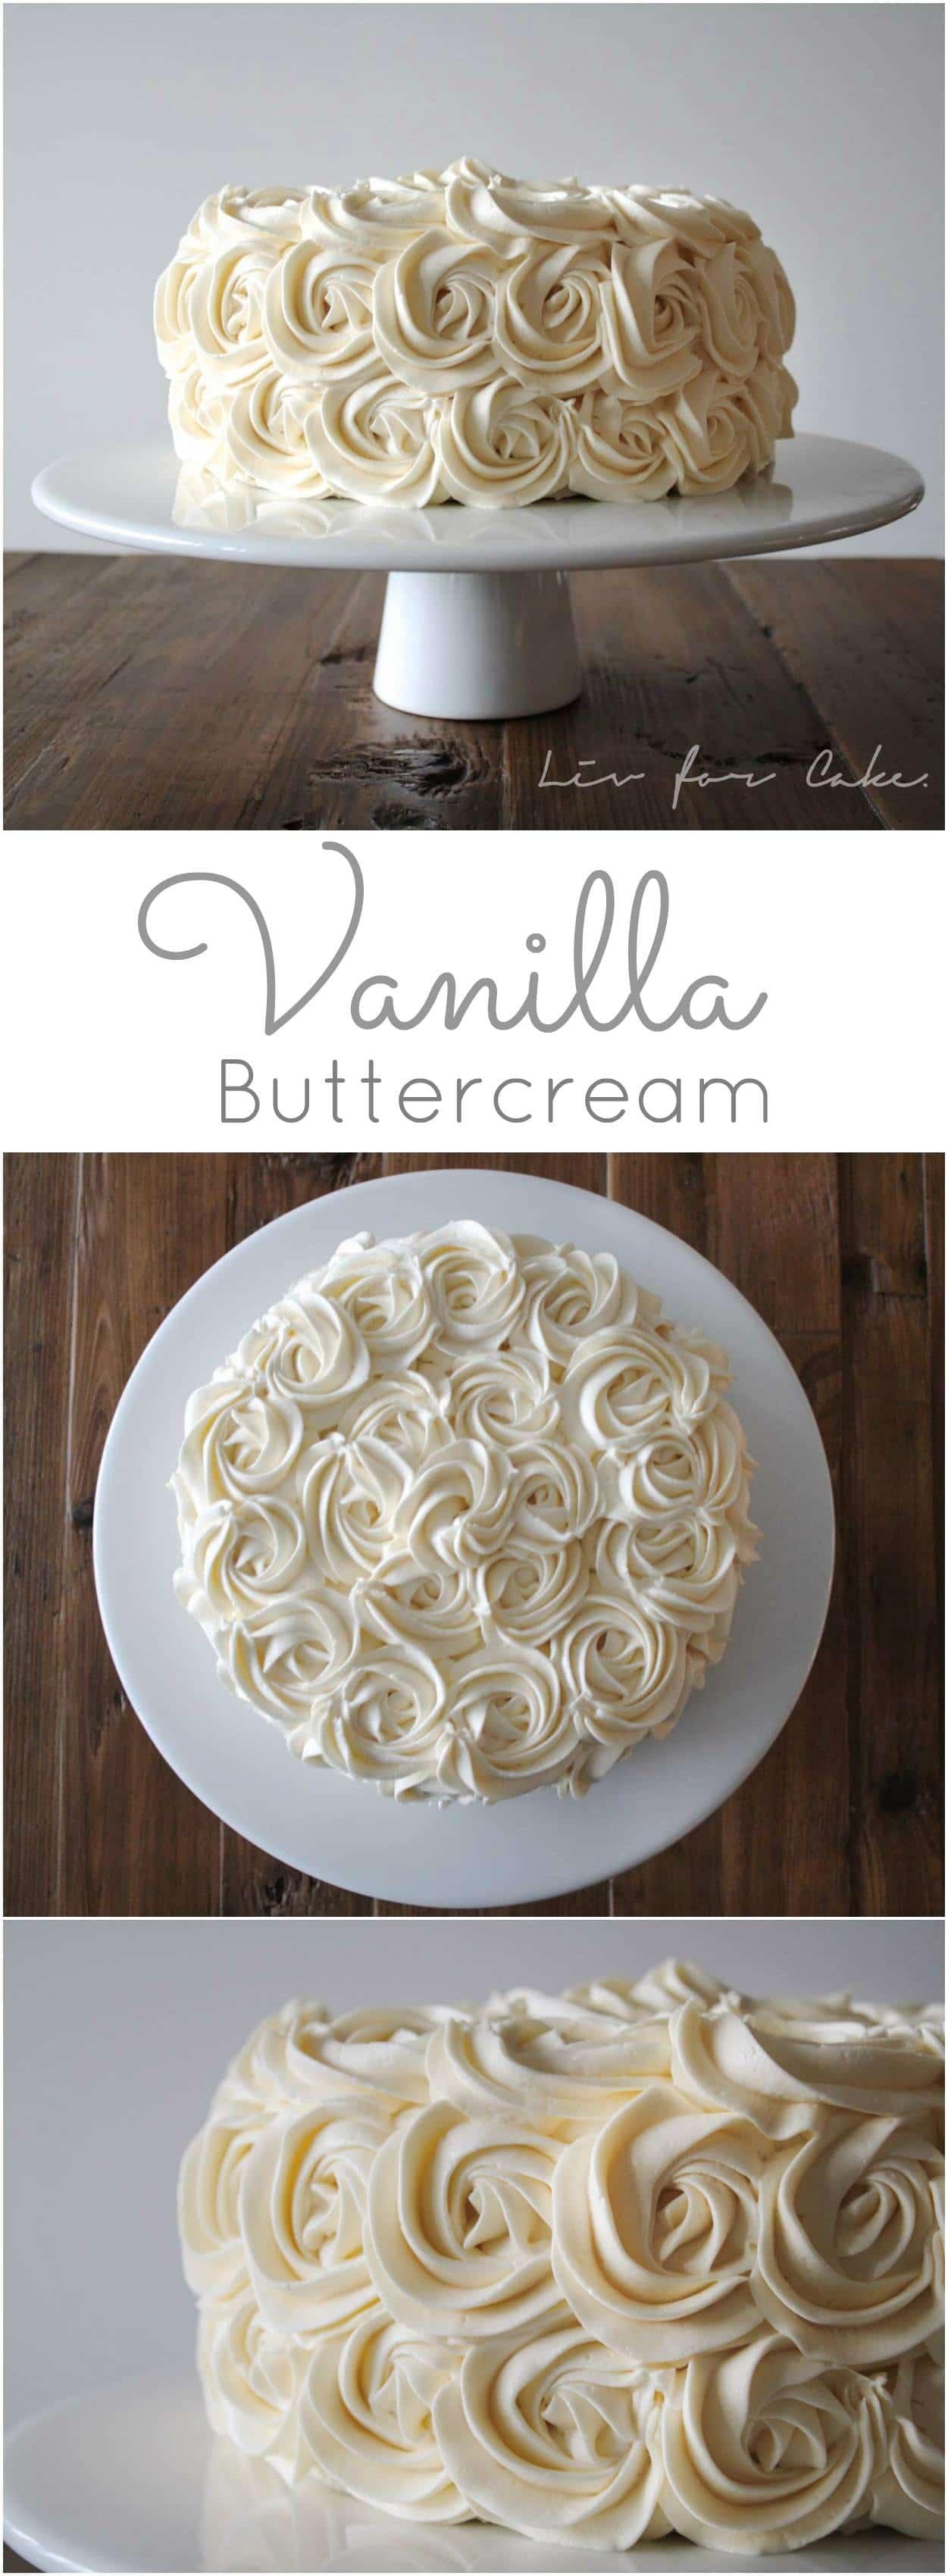 Simple Vanilla Buttercream collage